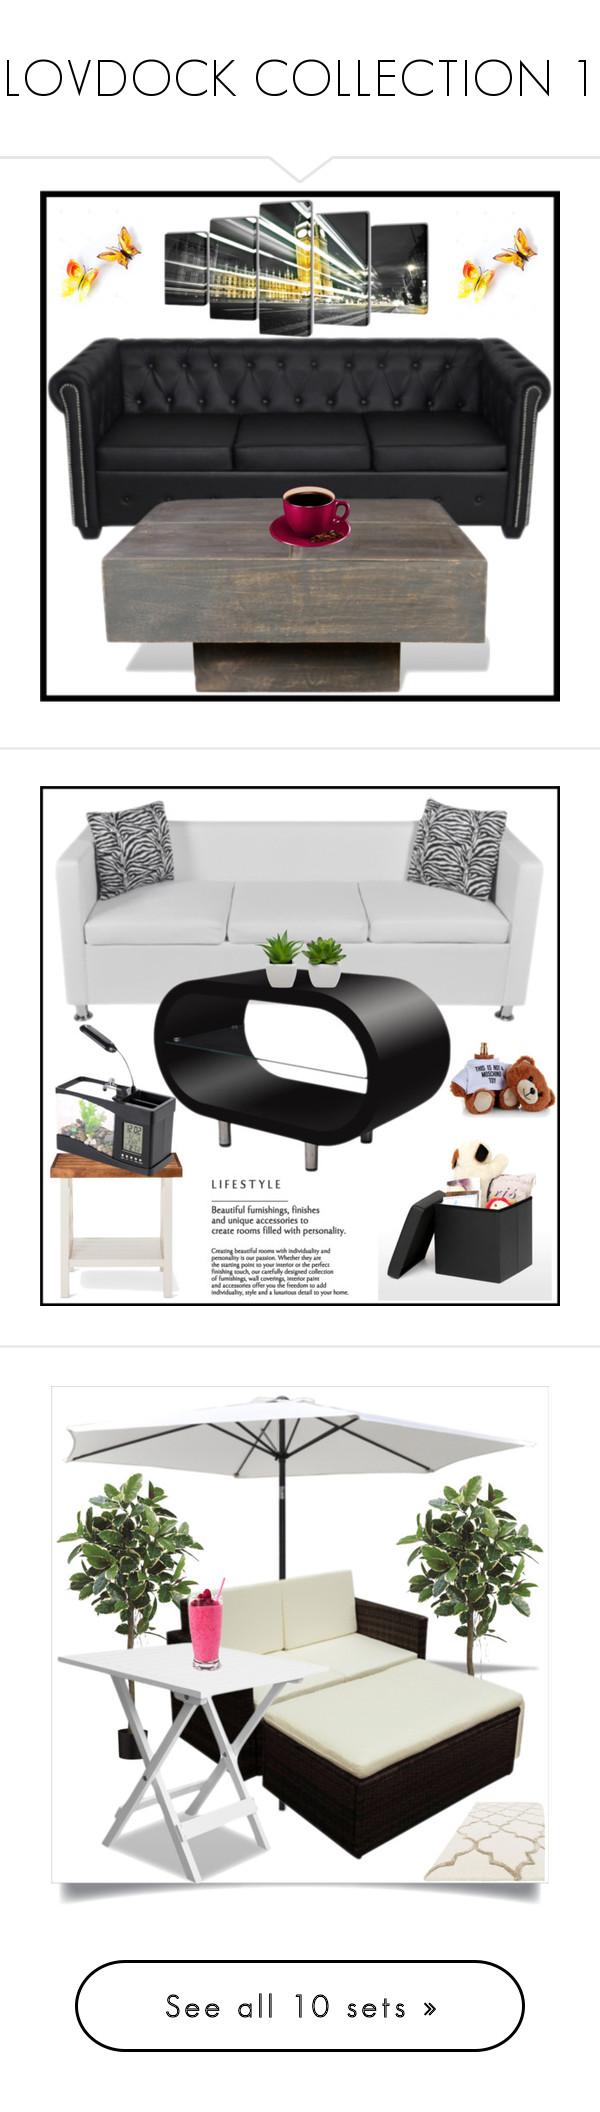 """LOVDOCK COLLECTION 1"" by merisa-imsirovic ❤ liked on Polyvore featuring interior, interiors, interior design, home, home decor, interior decorating, Moschino, Luigi Bormioli, Schott Zwiesel and Improvements"